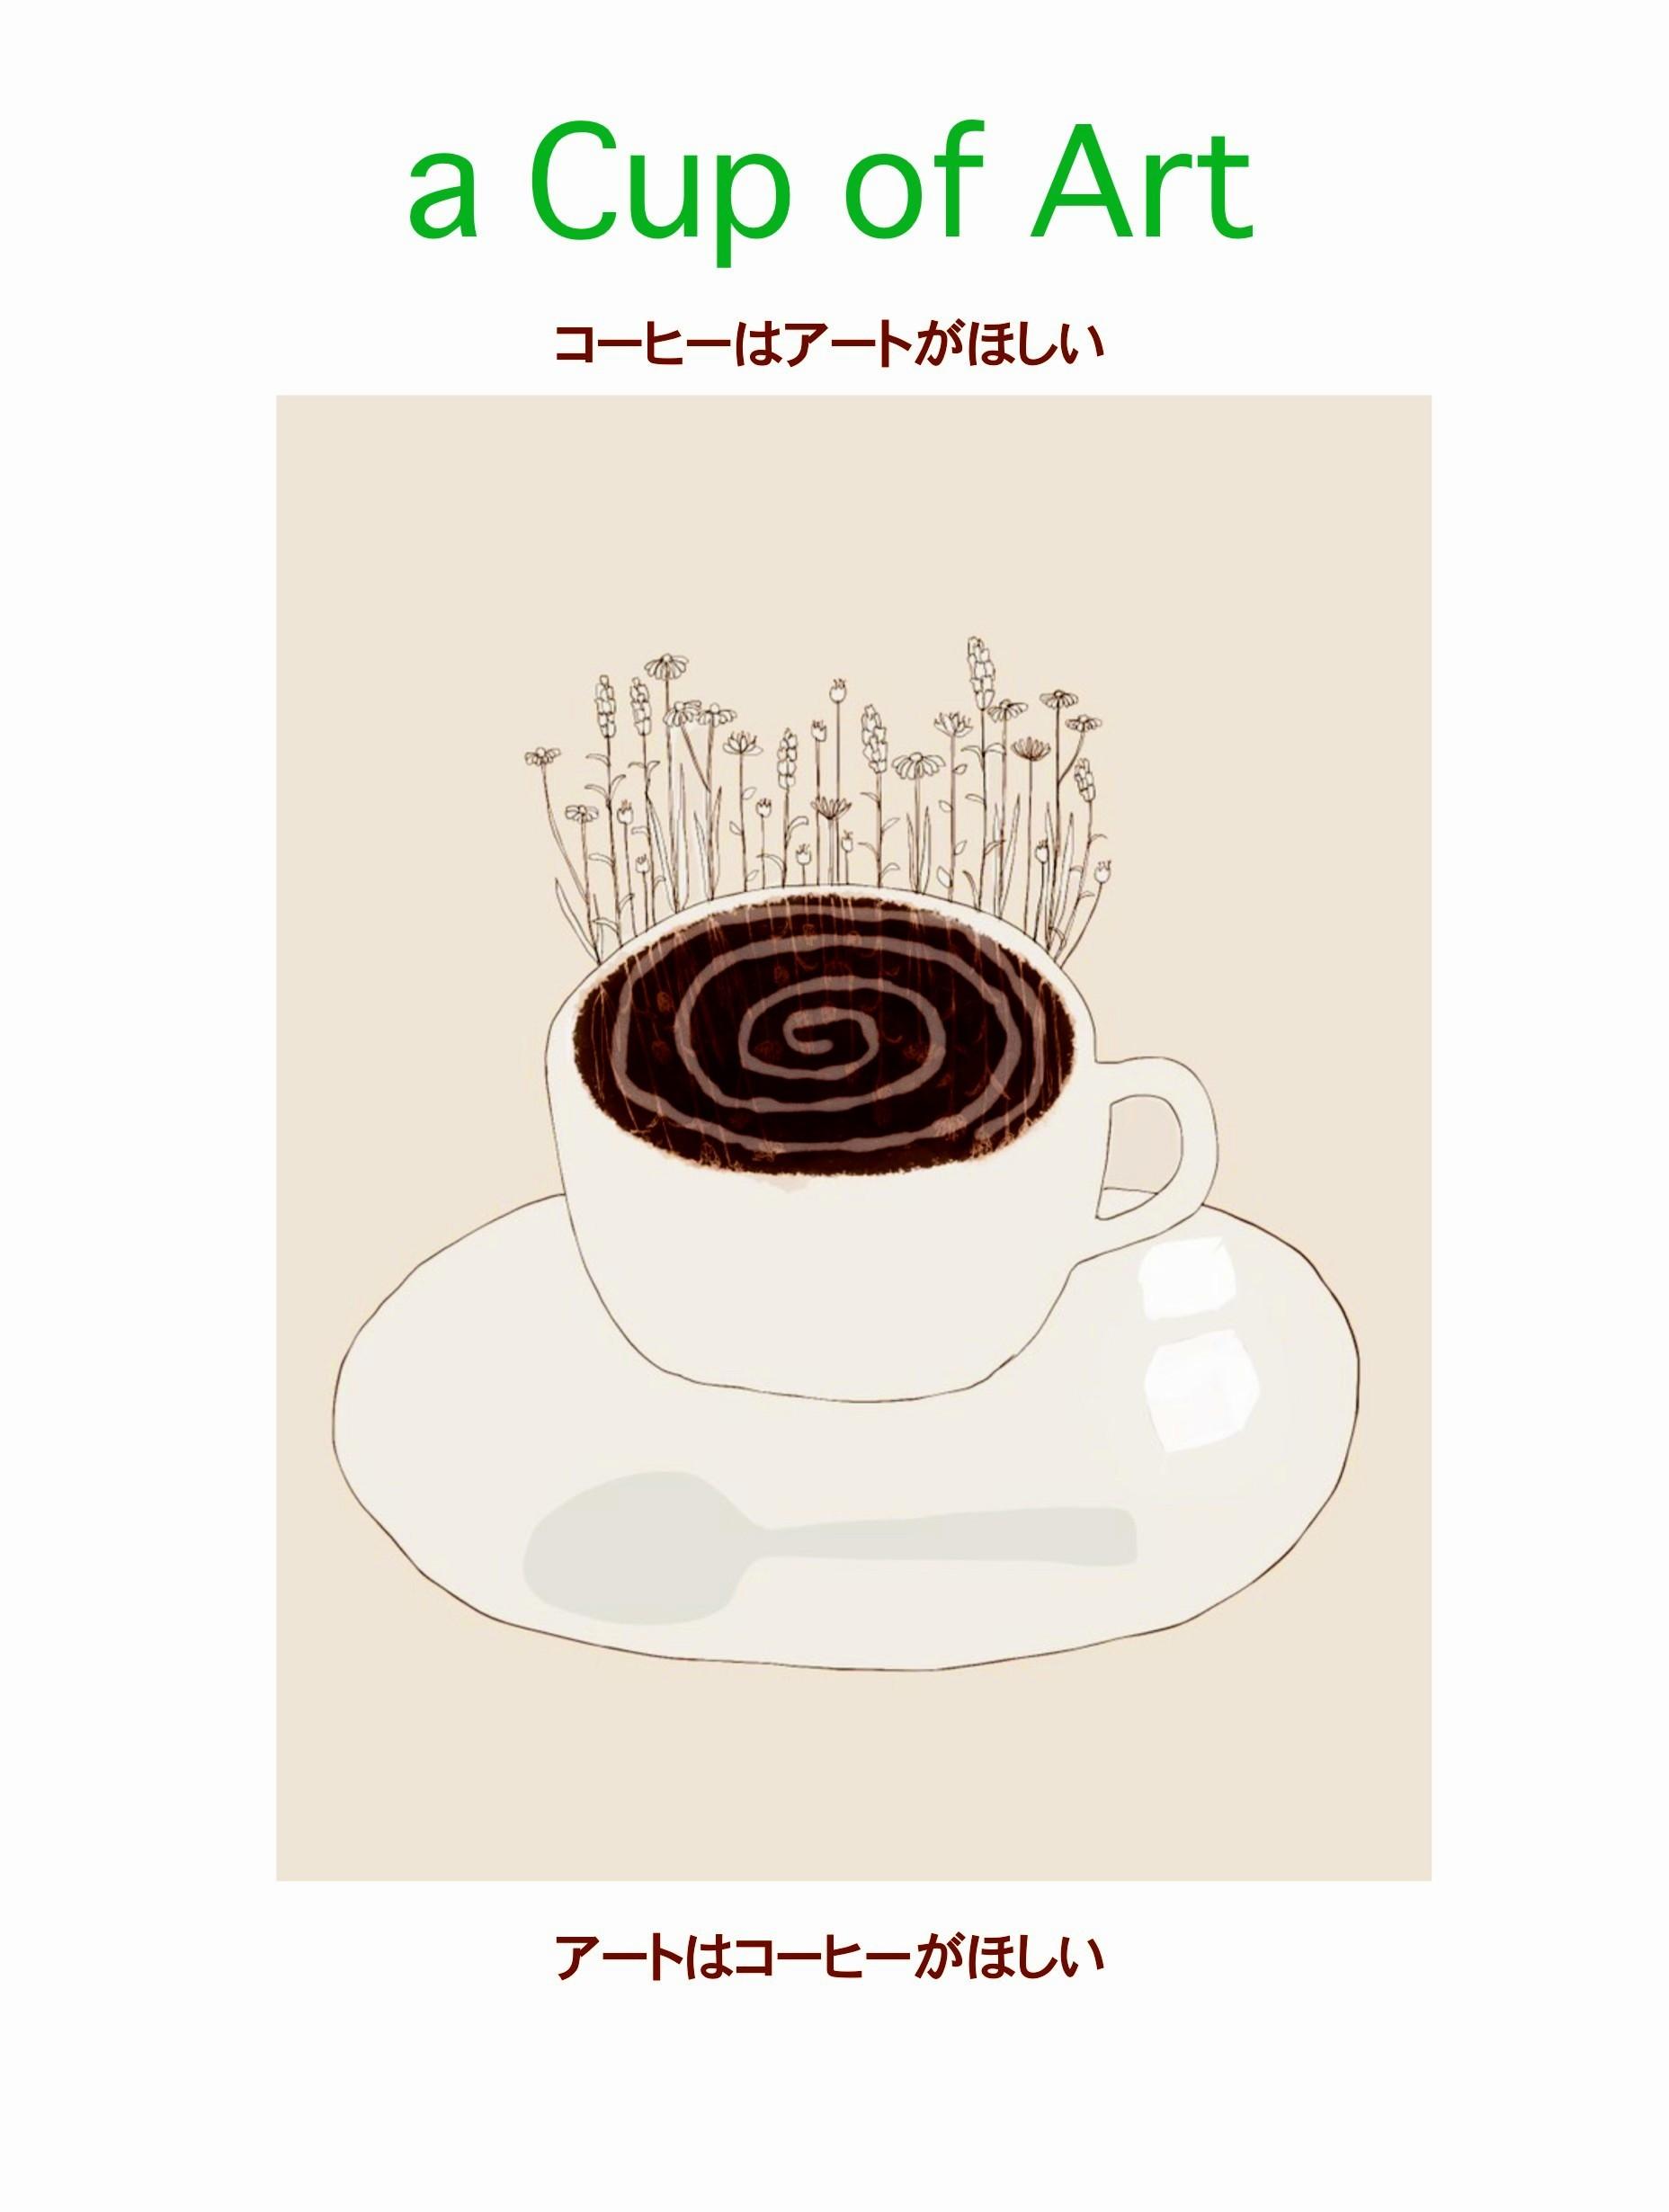 a cup of art 5.31---6.13_e0124863_22164224.jpeg